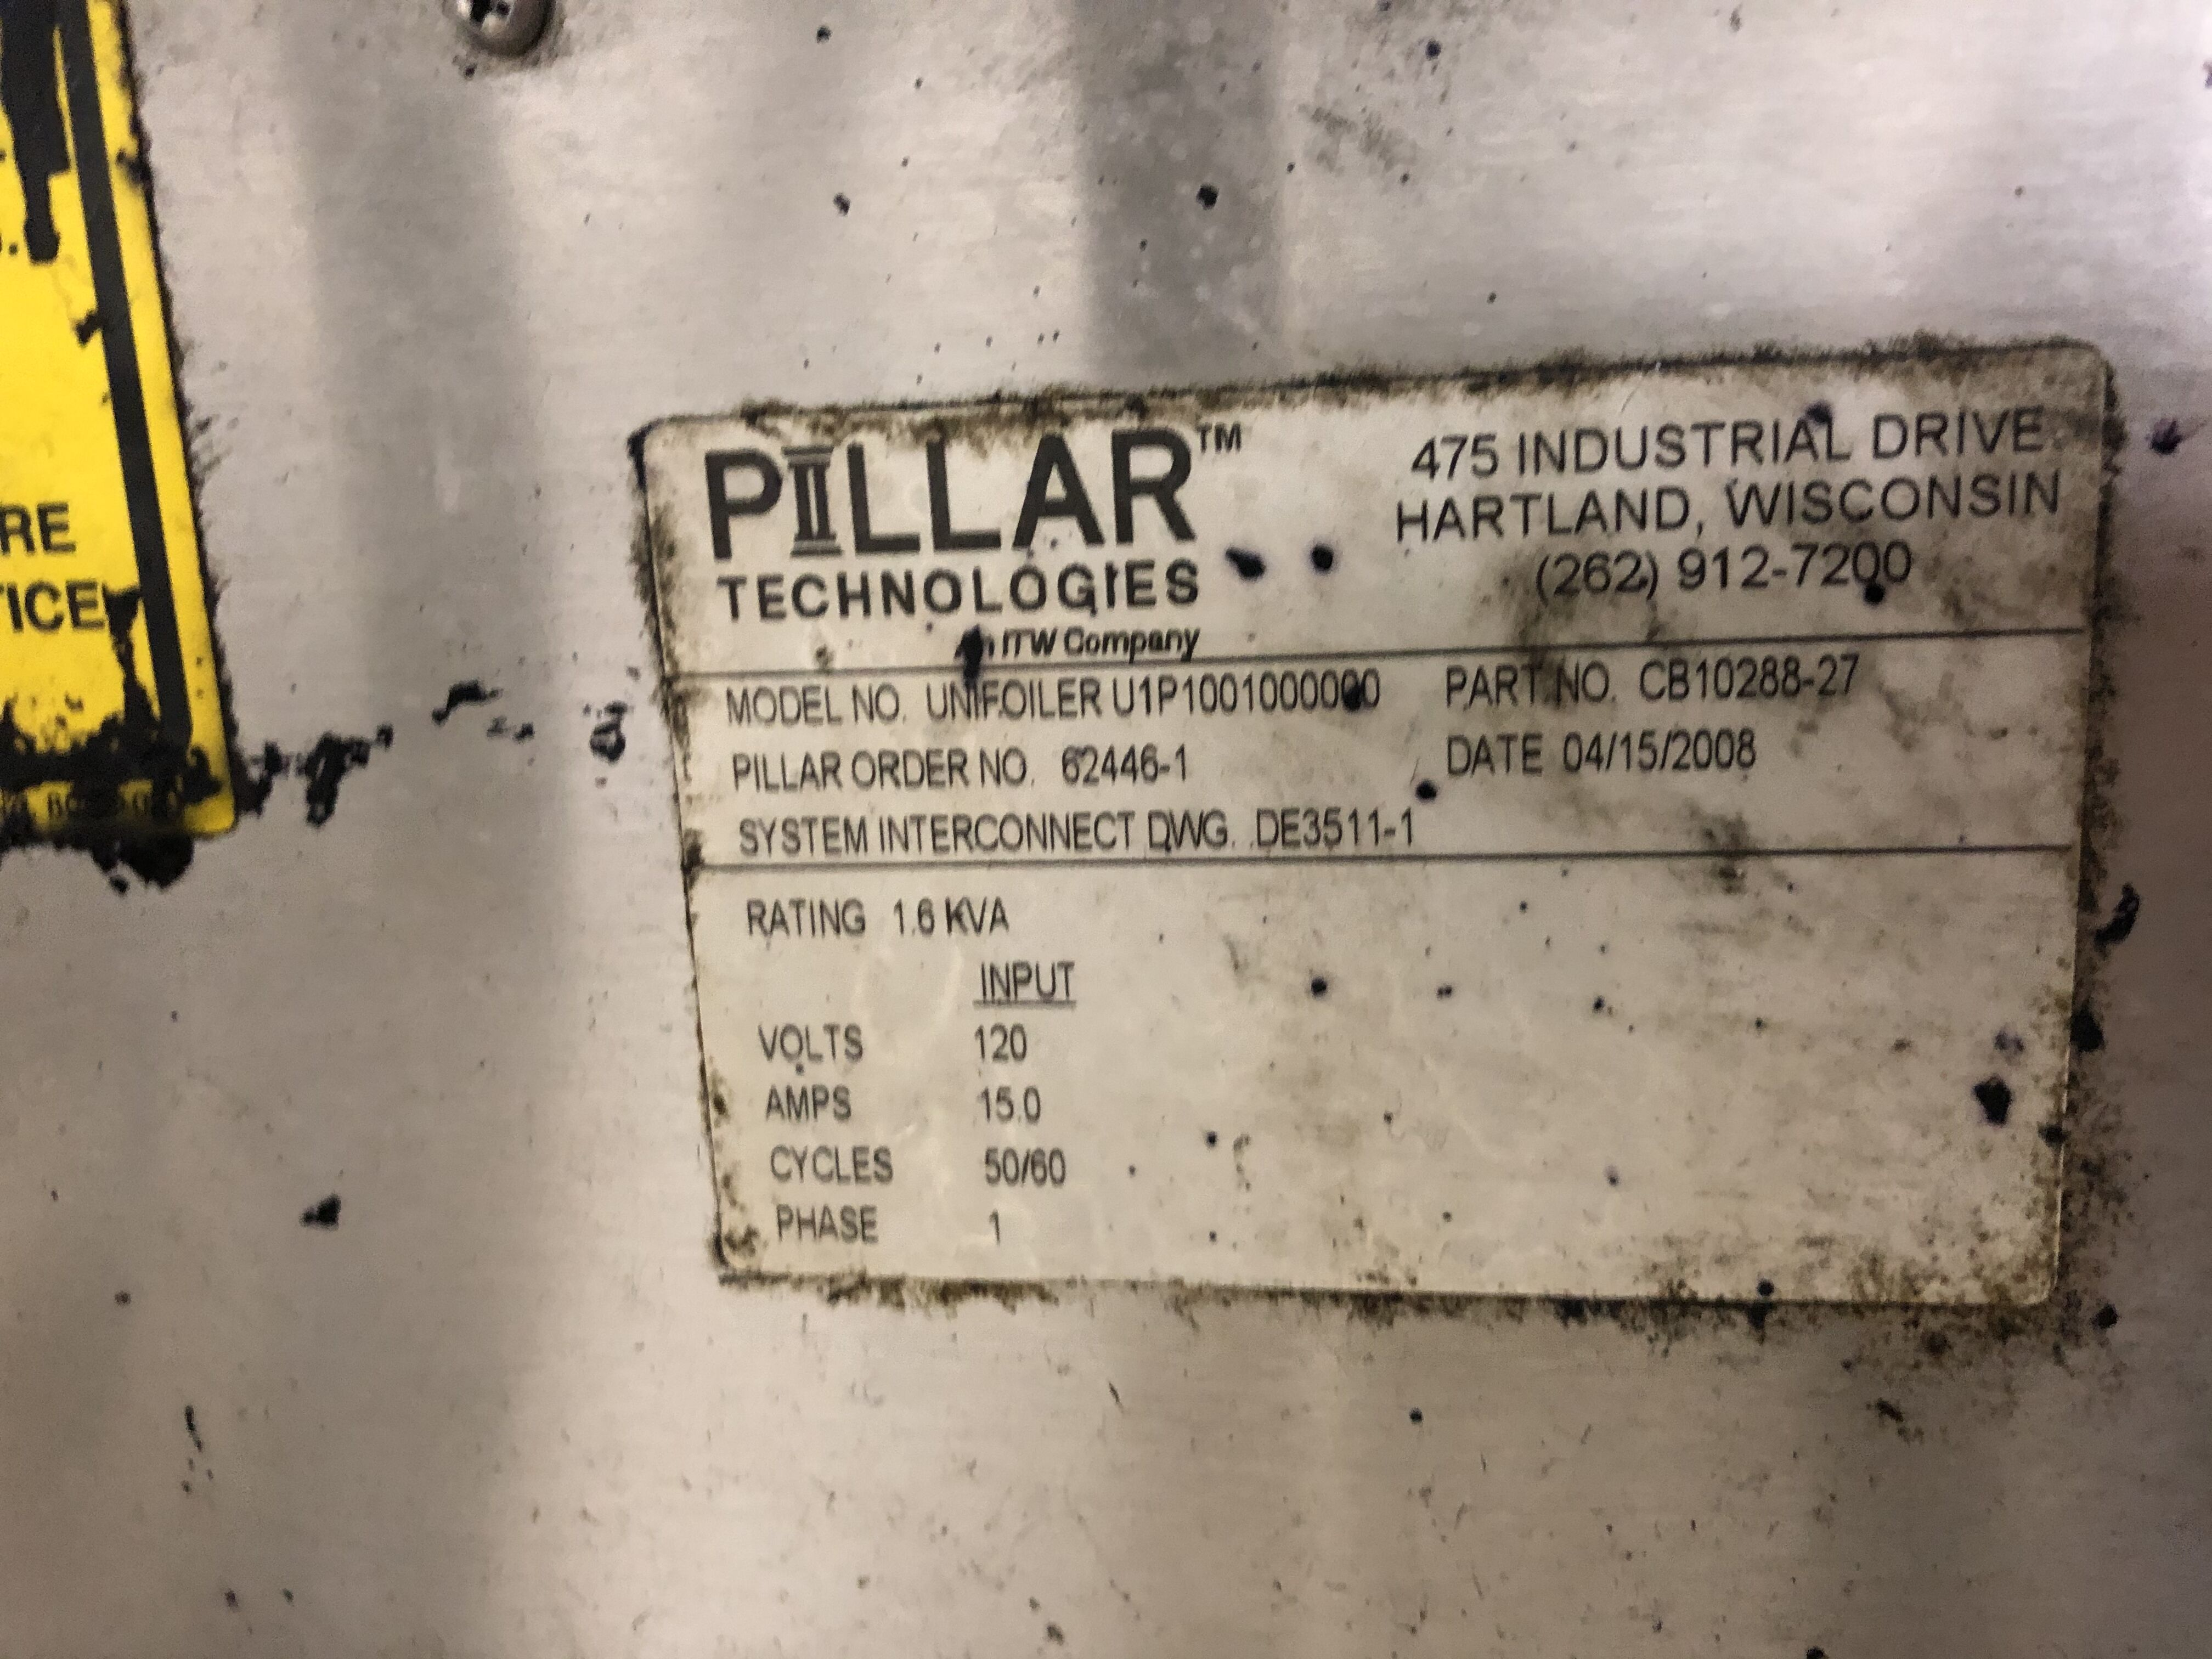 Pillar Technologies Unifoiler Cap Sealing Machine, Model #U1P1001000000, DOM April 2009 - Image 5 of 7